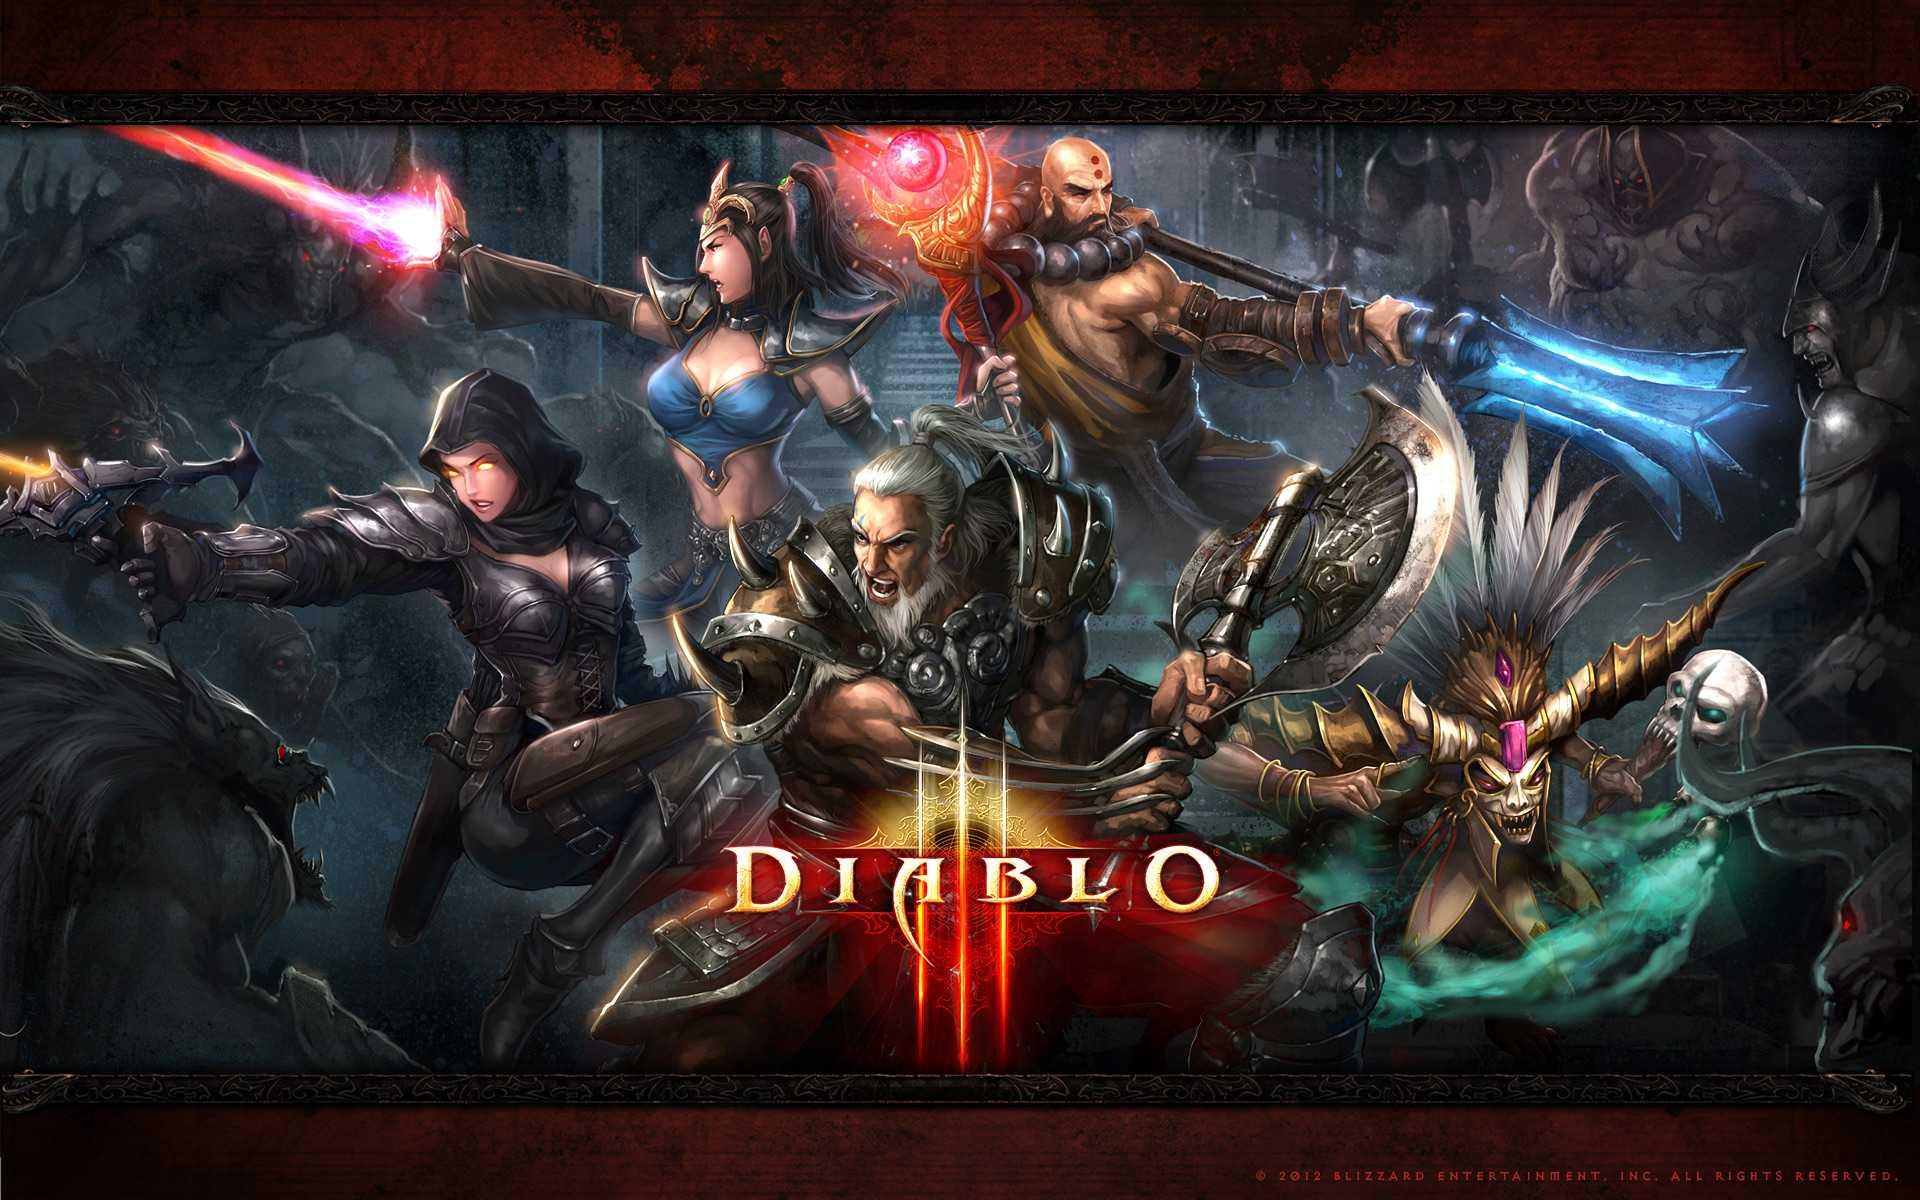 Дешево купить Diablo 3